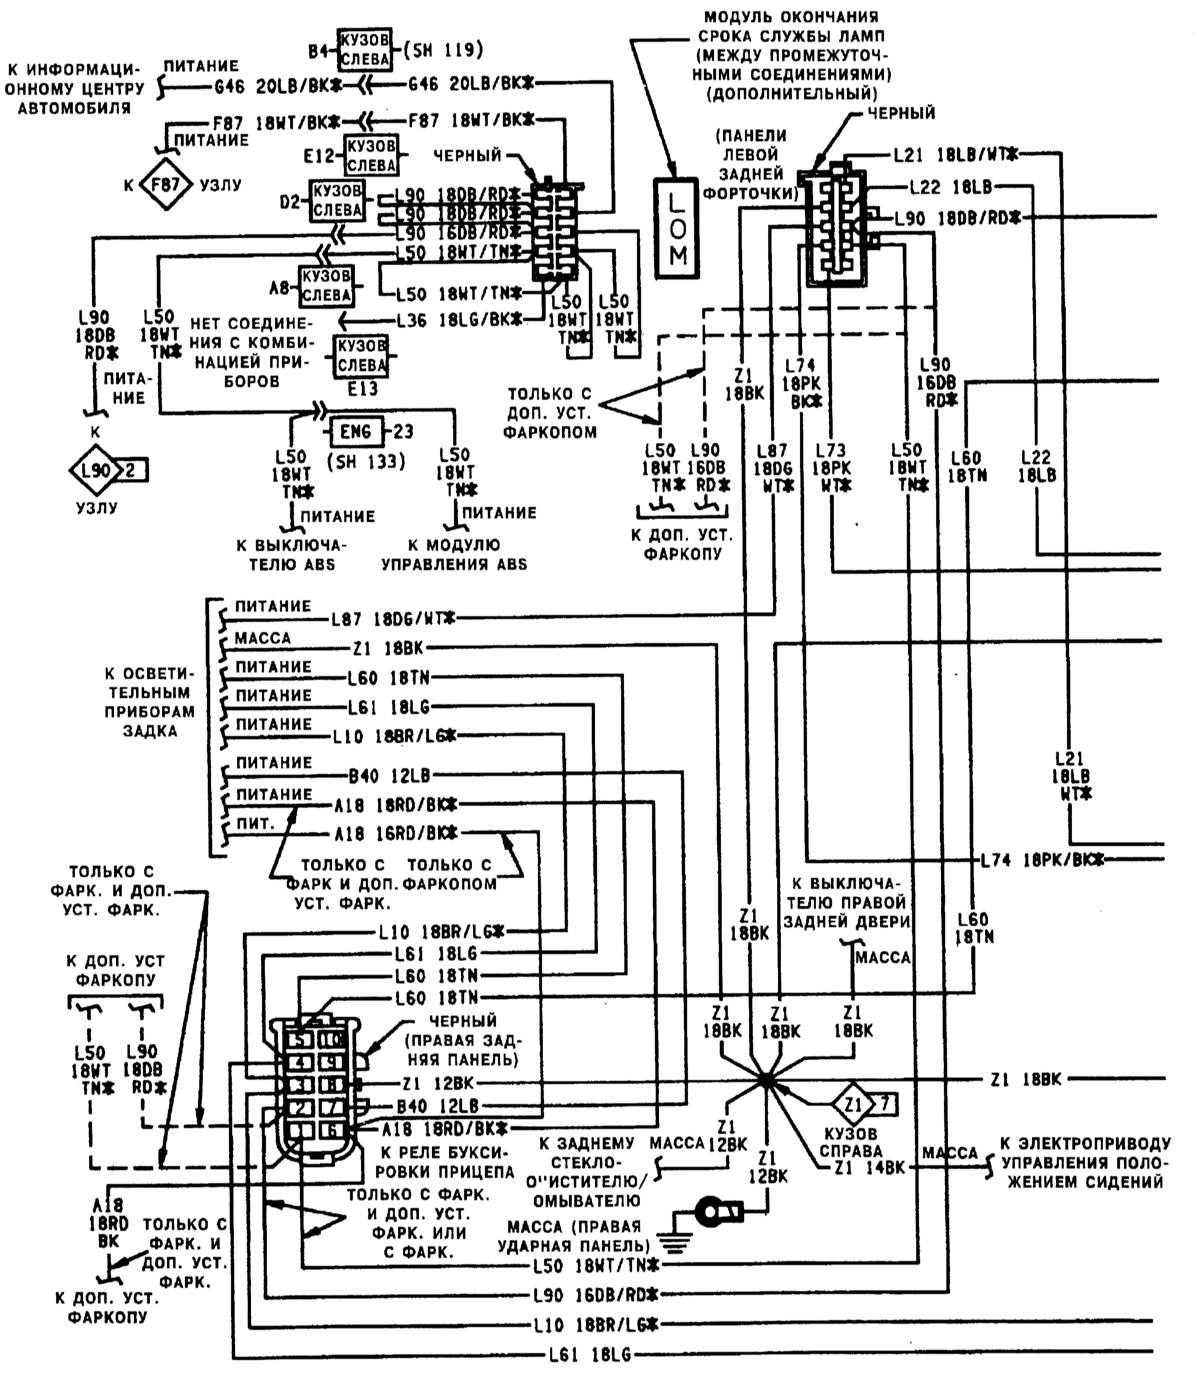 схема приема настойки бм и кщ